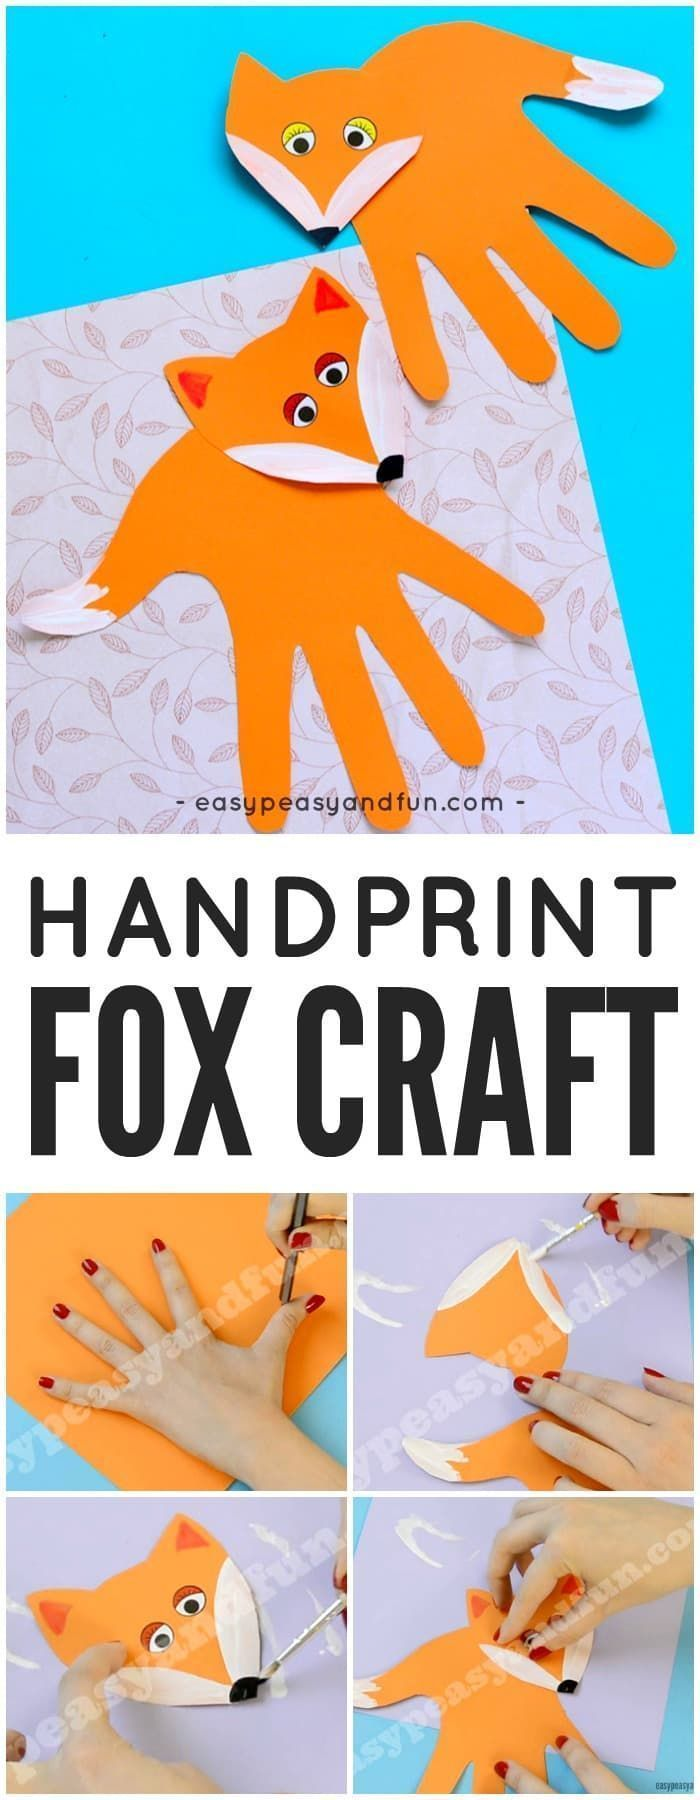 Handprint Fox Craft #animalcrafts